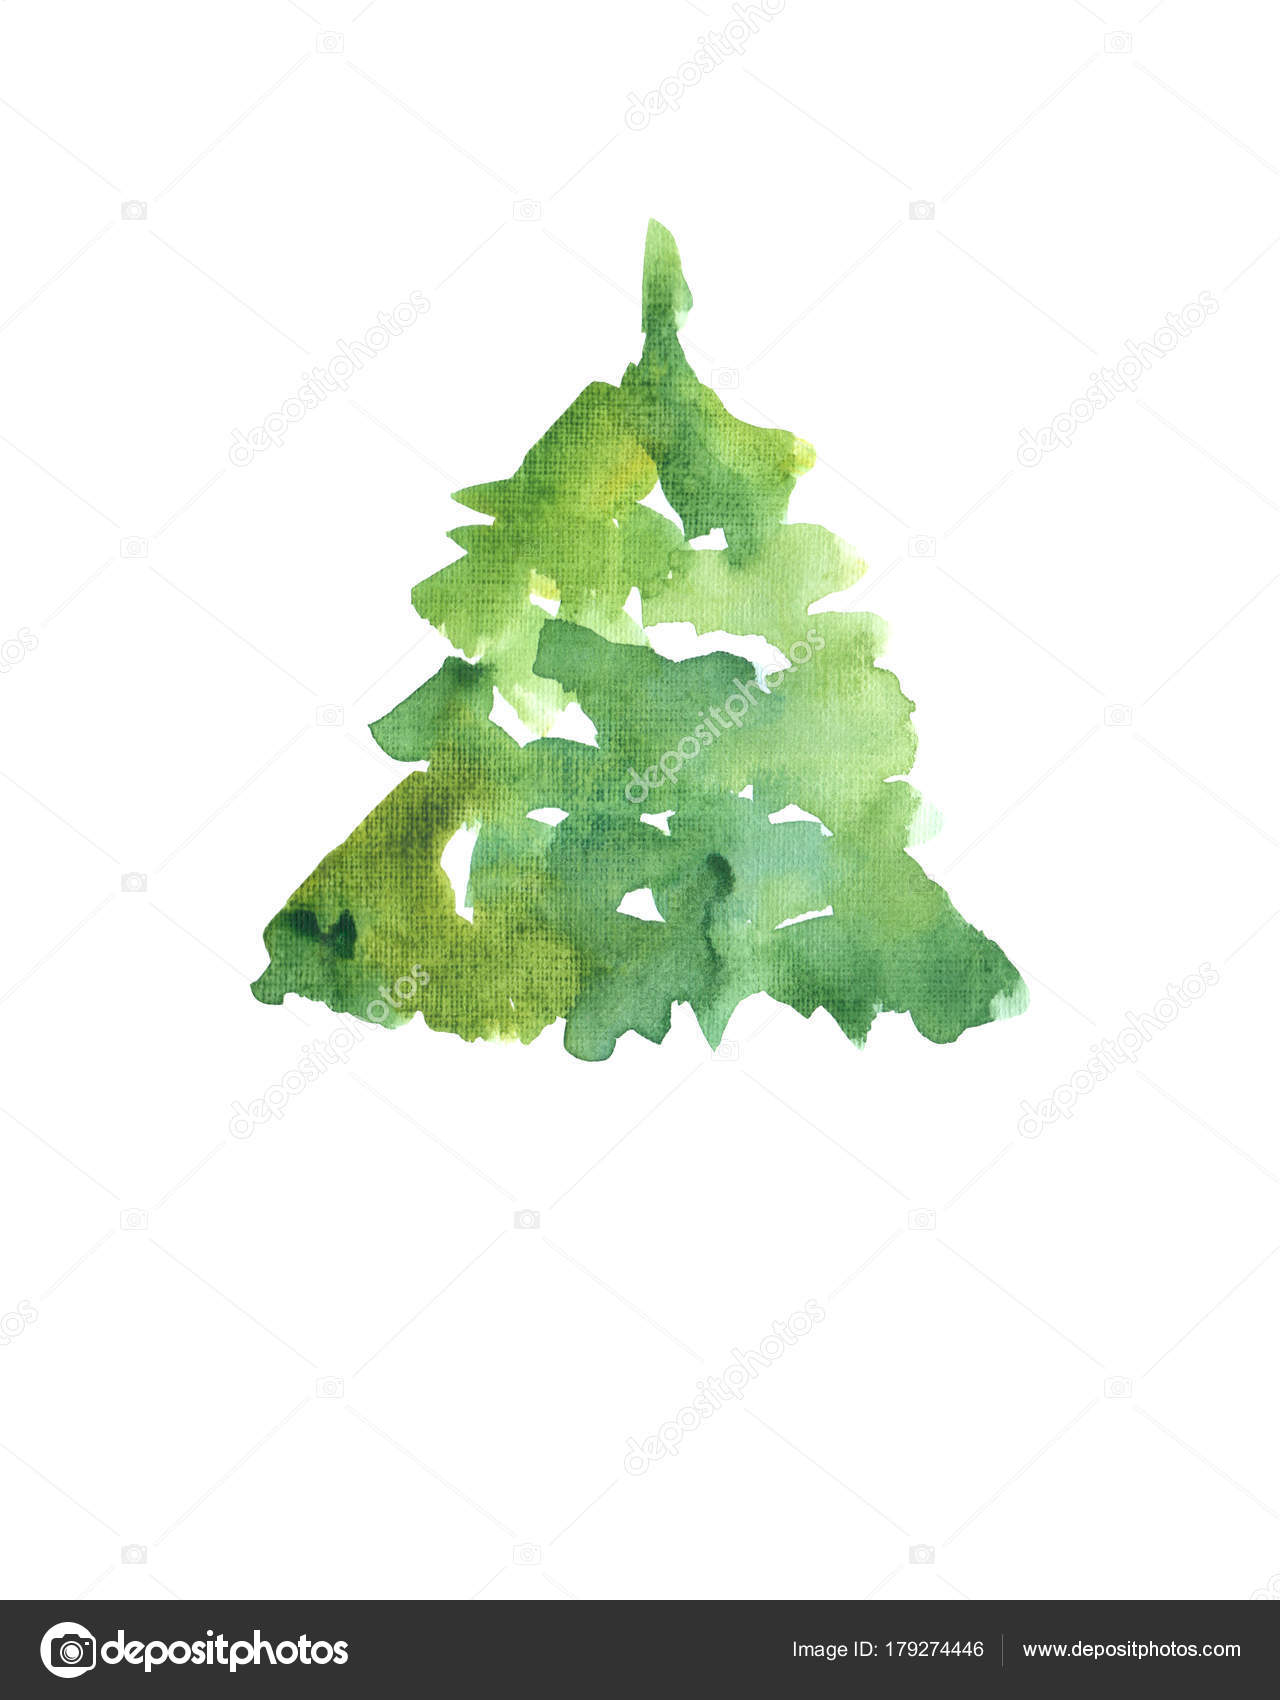 Sulu Boya Resim Yeşil çam Ağacı Stok Foto Milanawork At Mailru